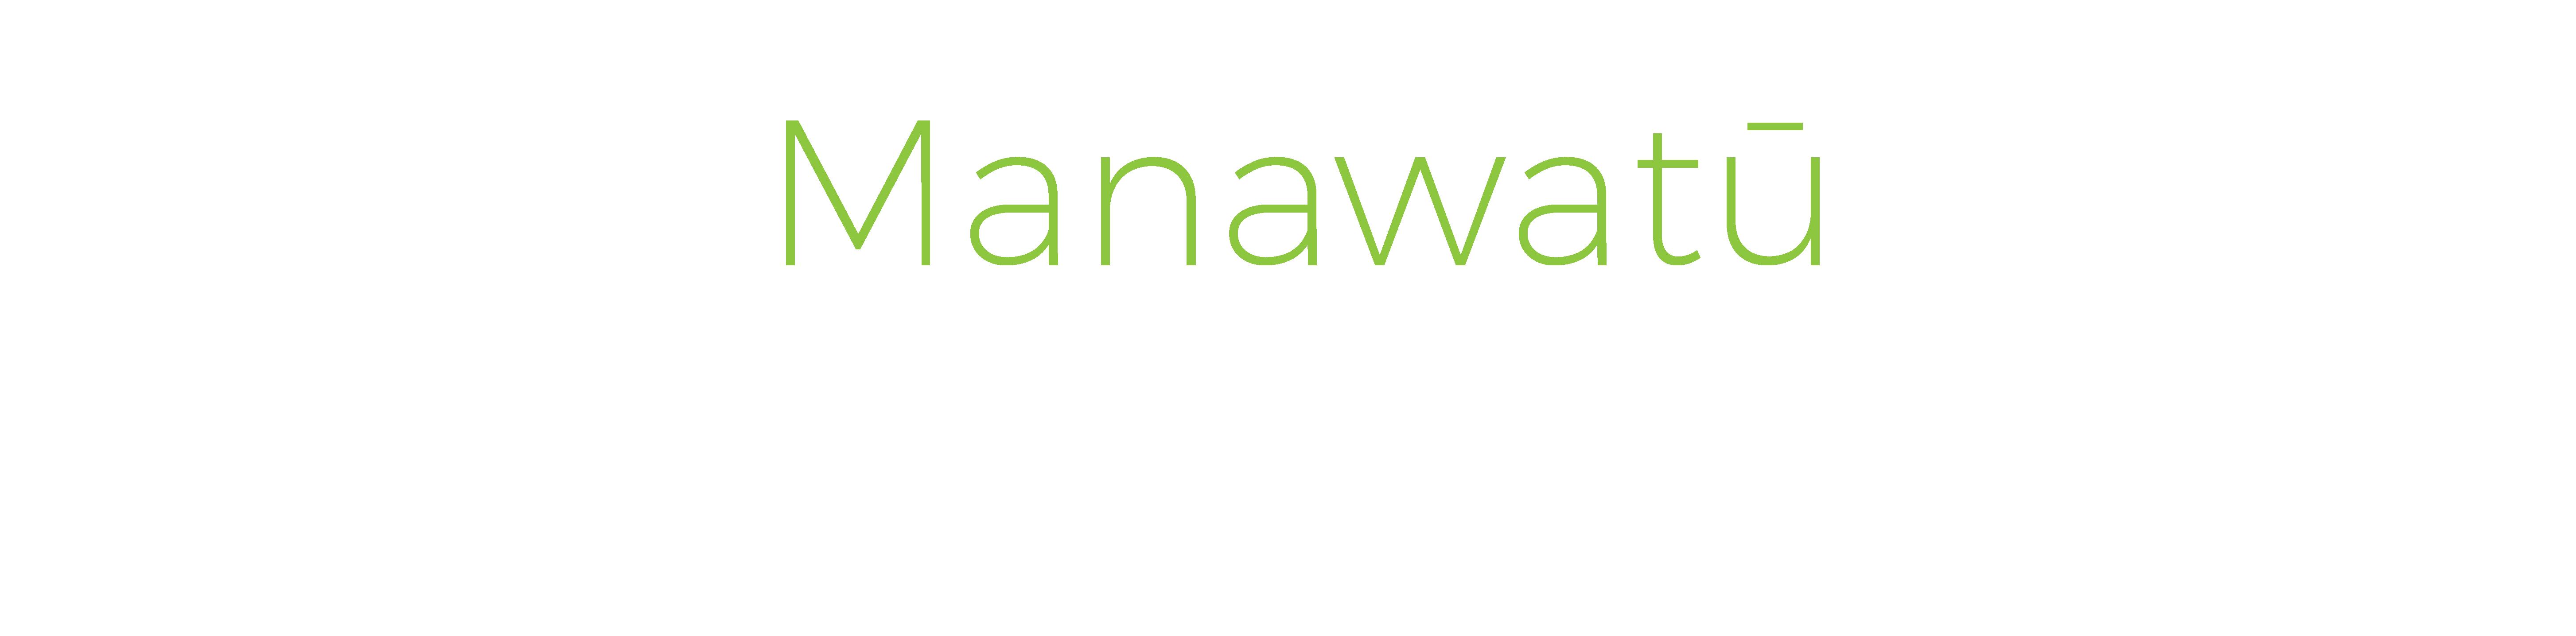 Manawatu Inland Port